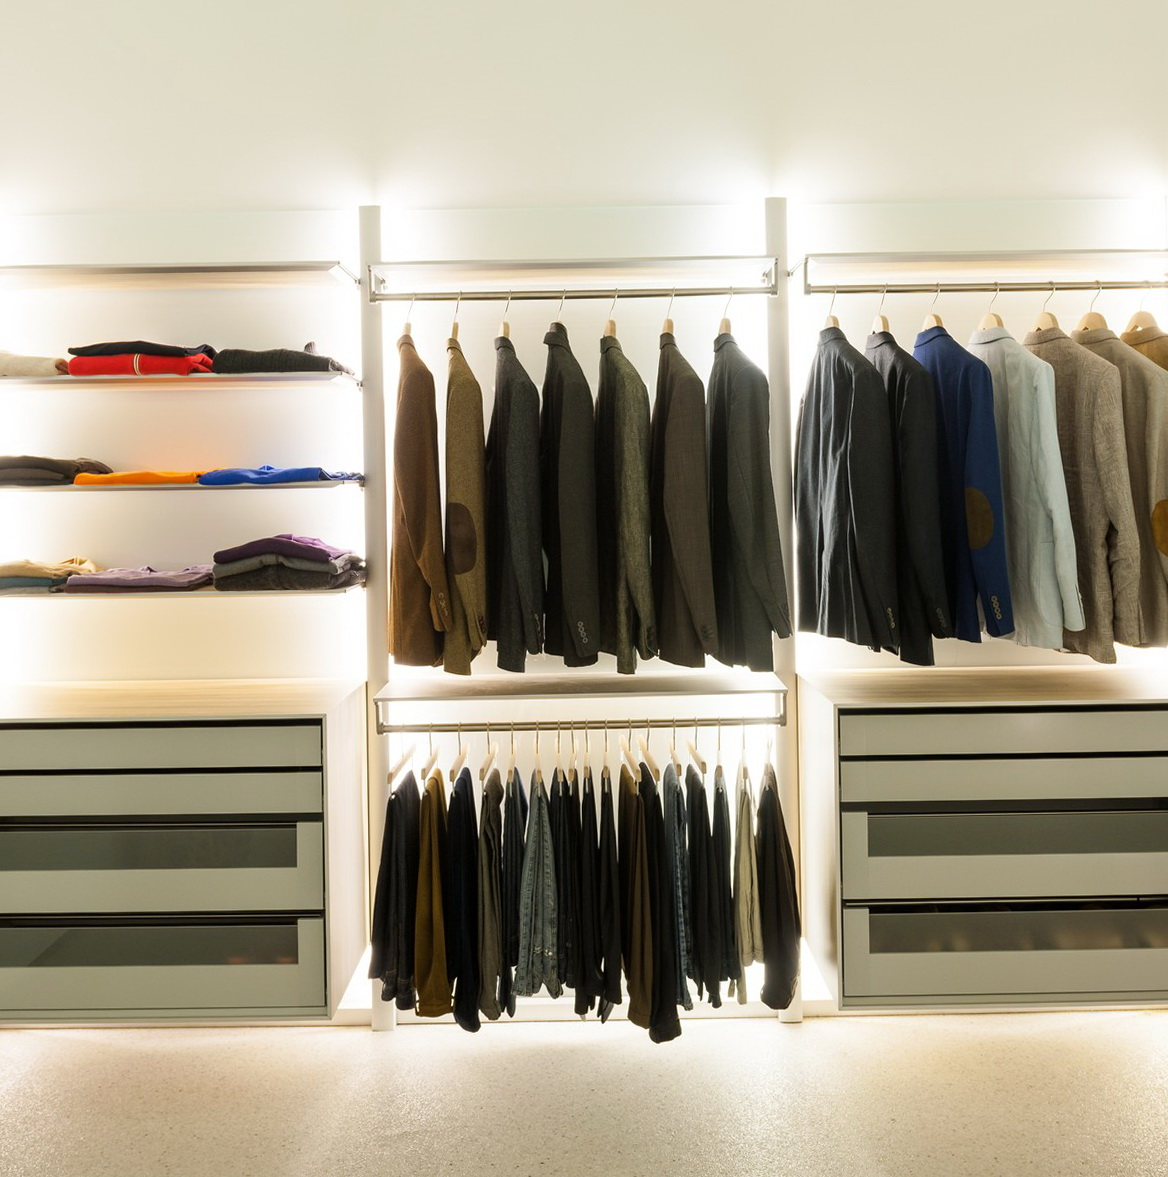 Hanging Closet Organizer With Drawers